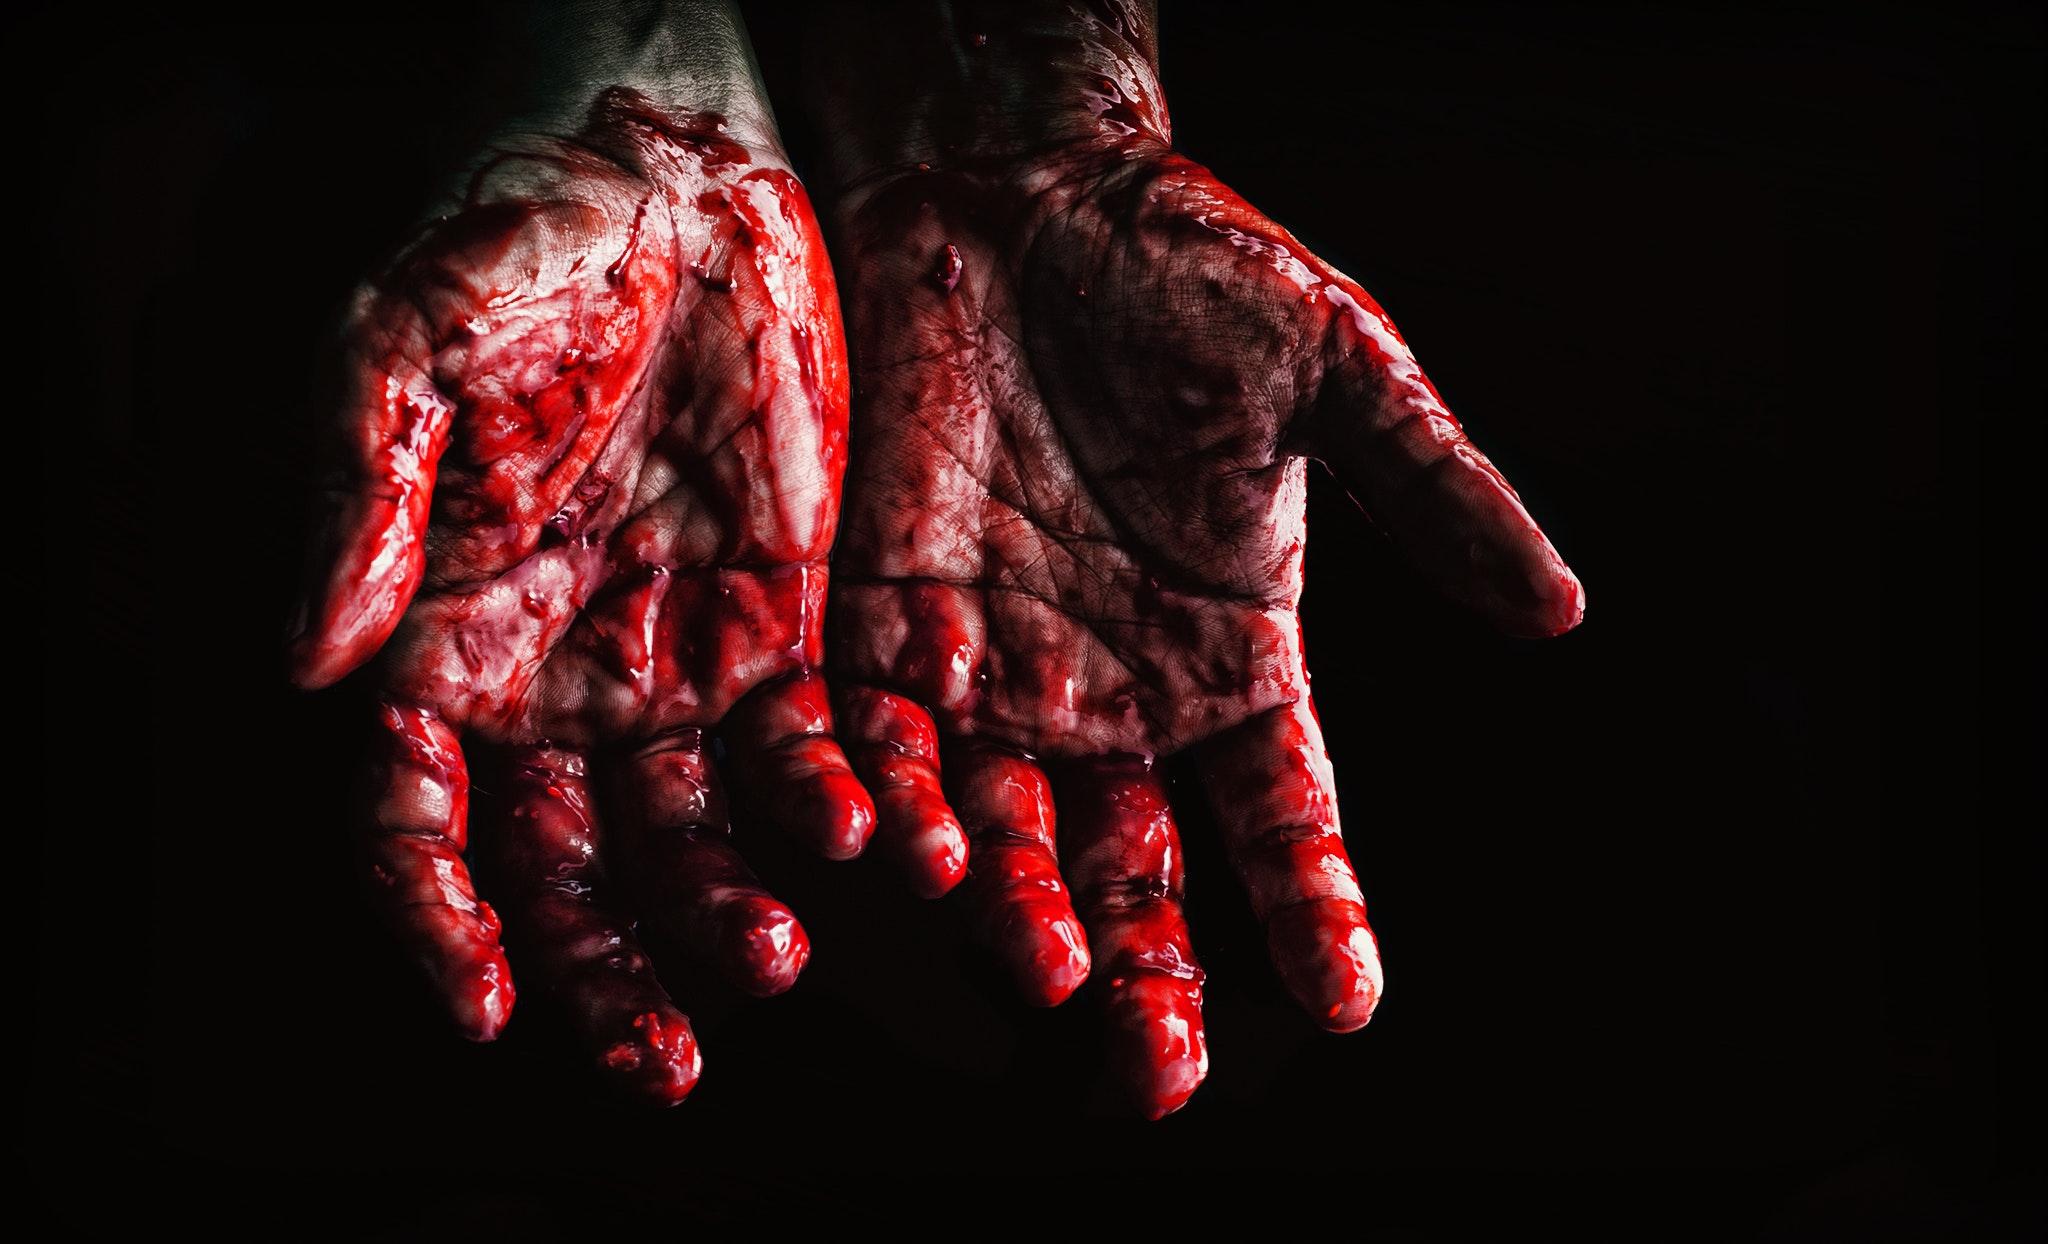 black-background-blood-bloody-673862